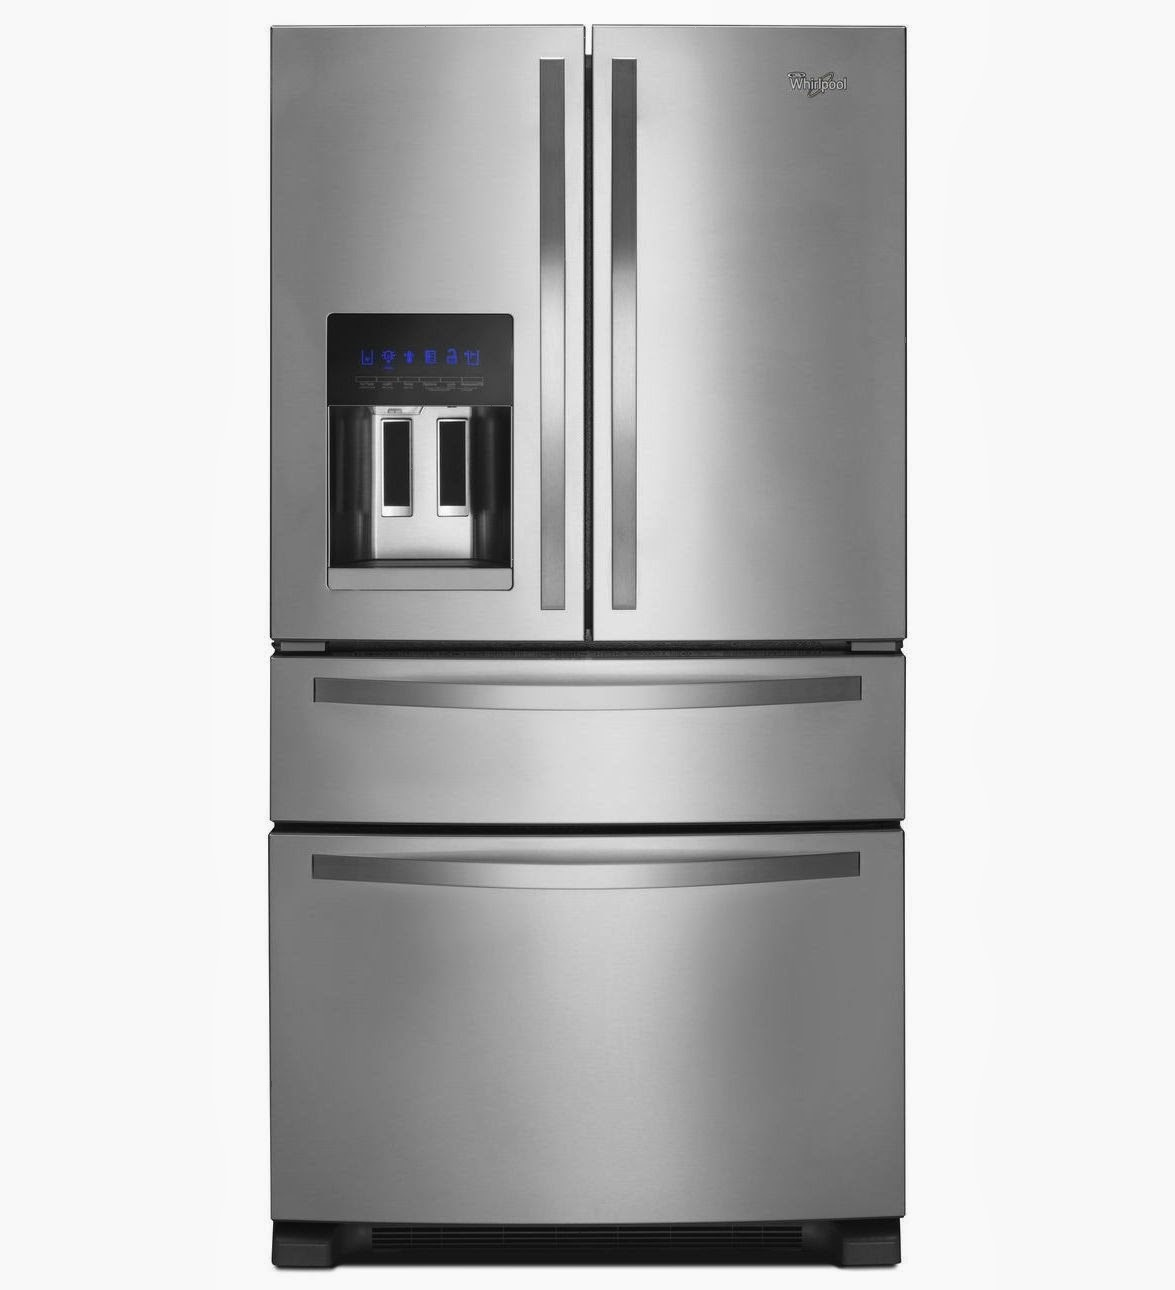 Whirlpool Refrigerator Brand: Whirlpool 25 CF French Door ...